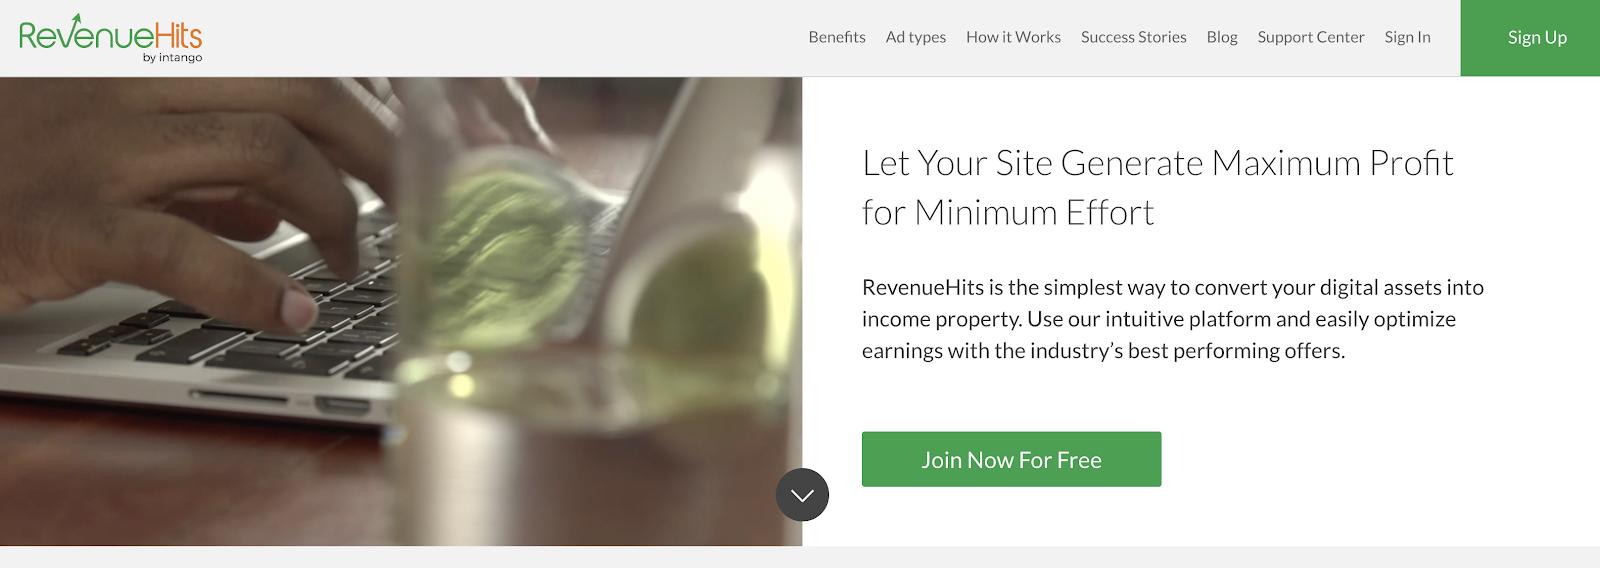 RevenueHits Blog Ad Network (Homepage Screenshot)